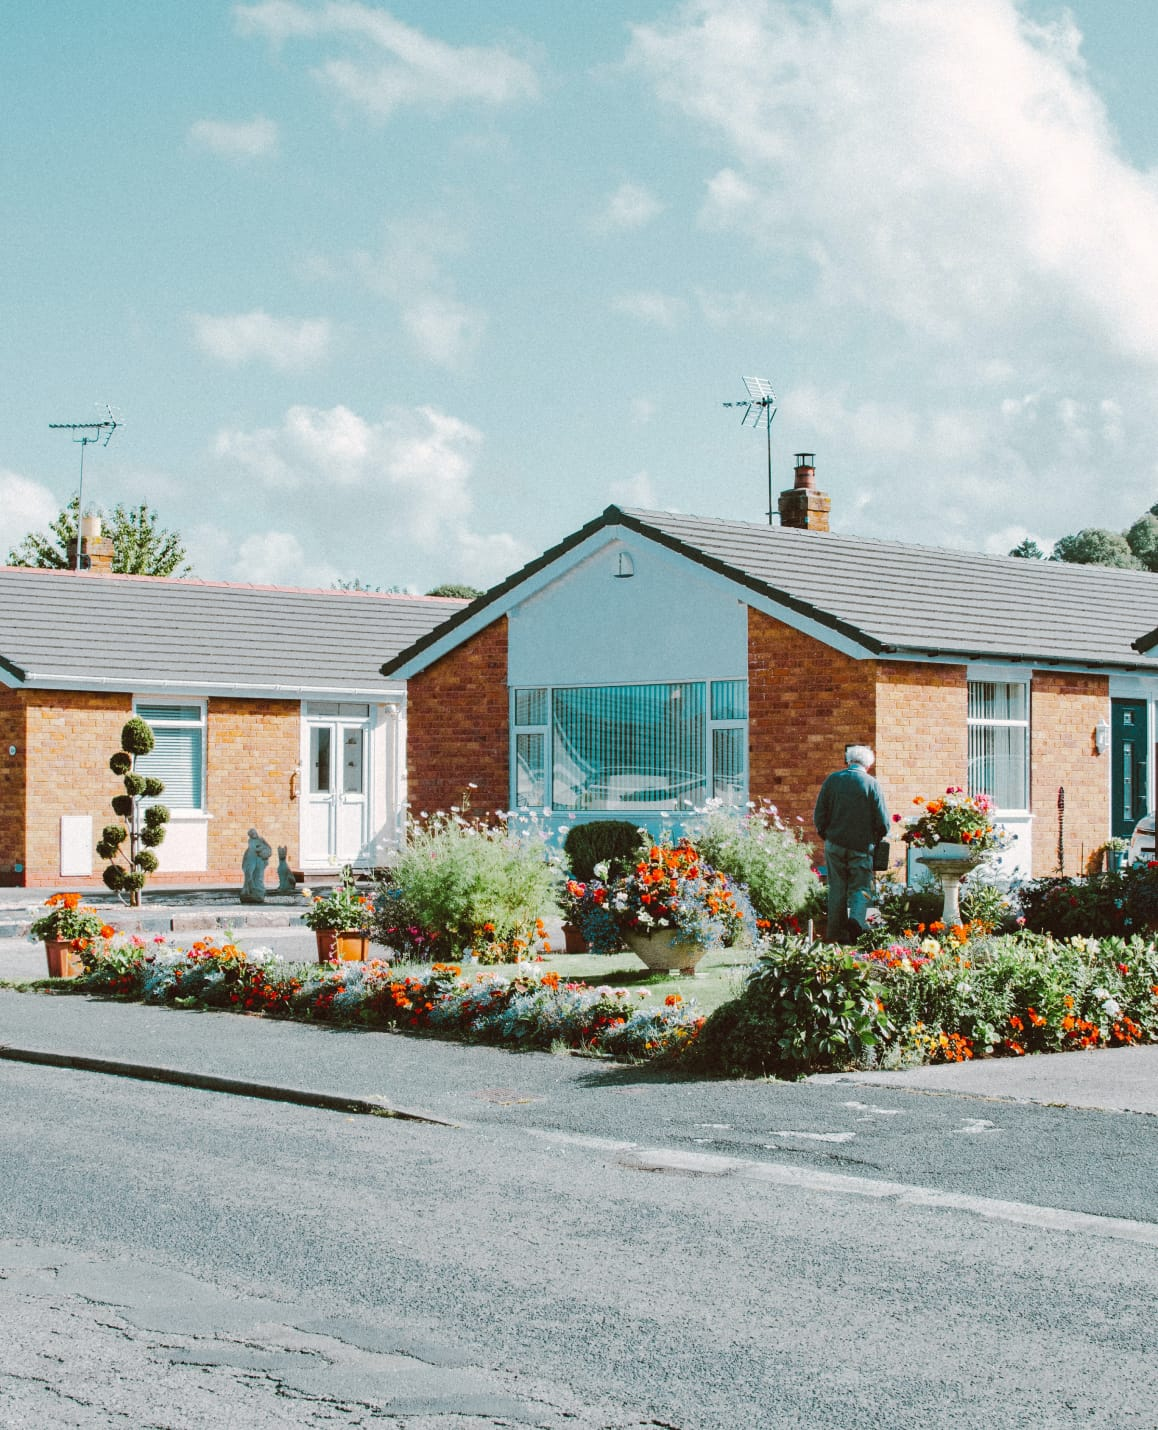 Small brick bungalow facing the street